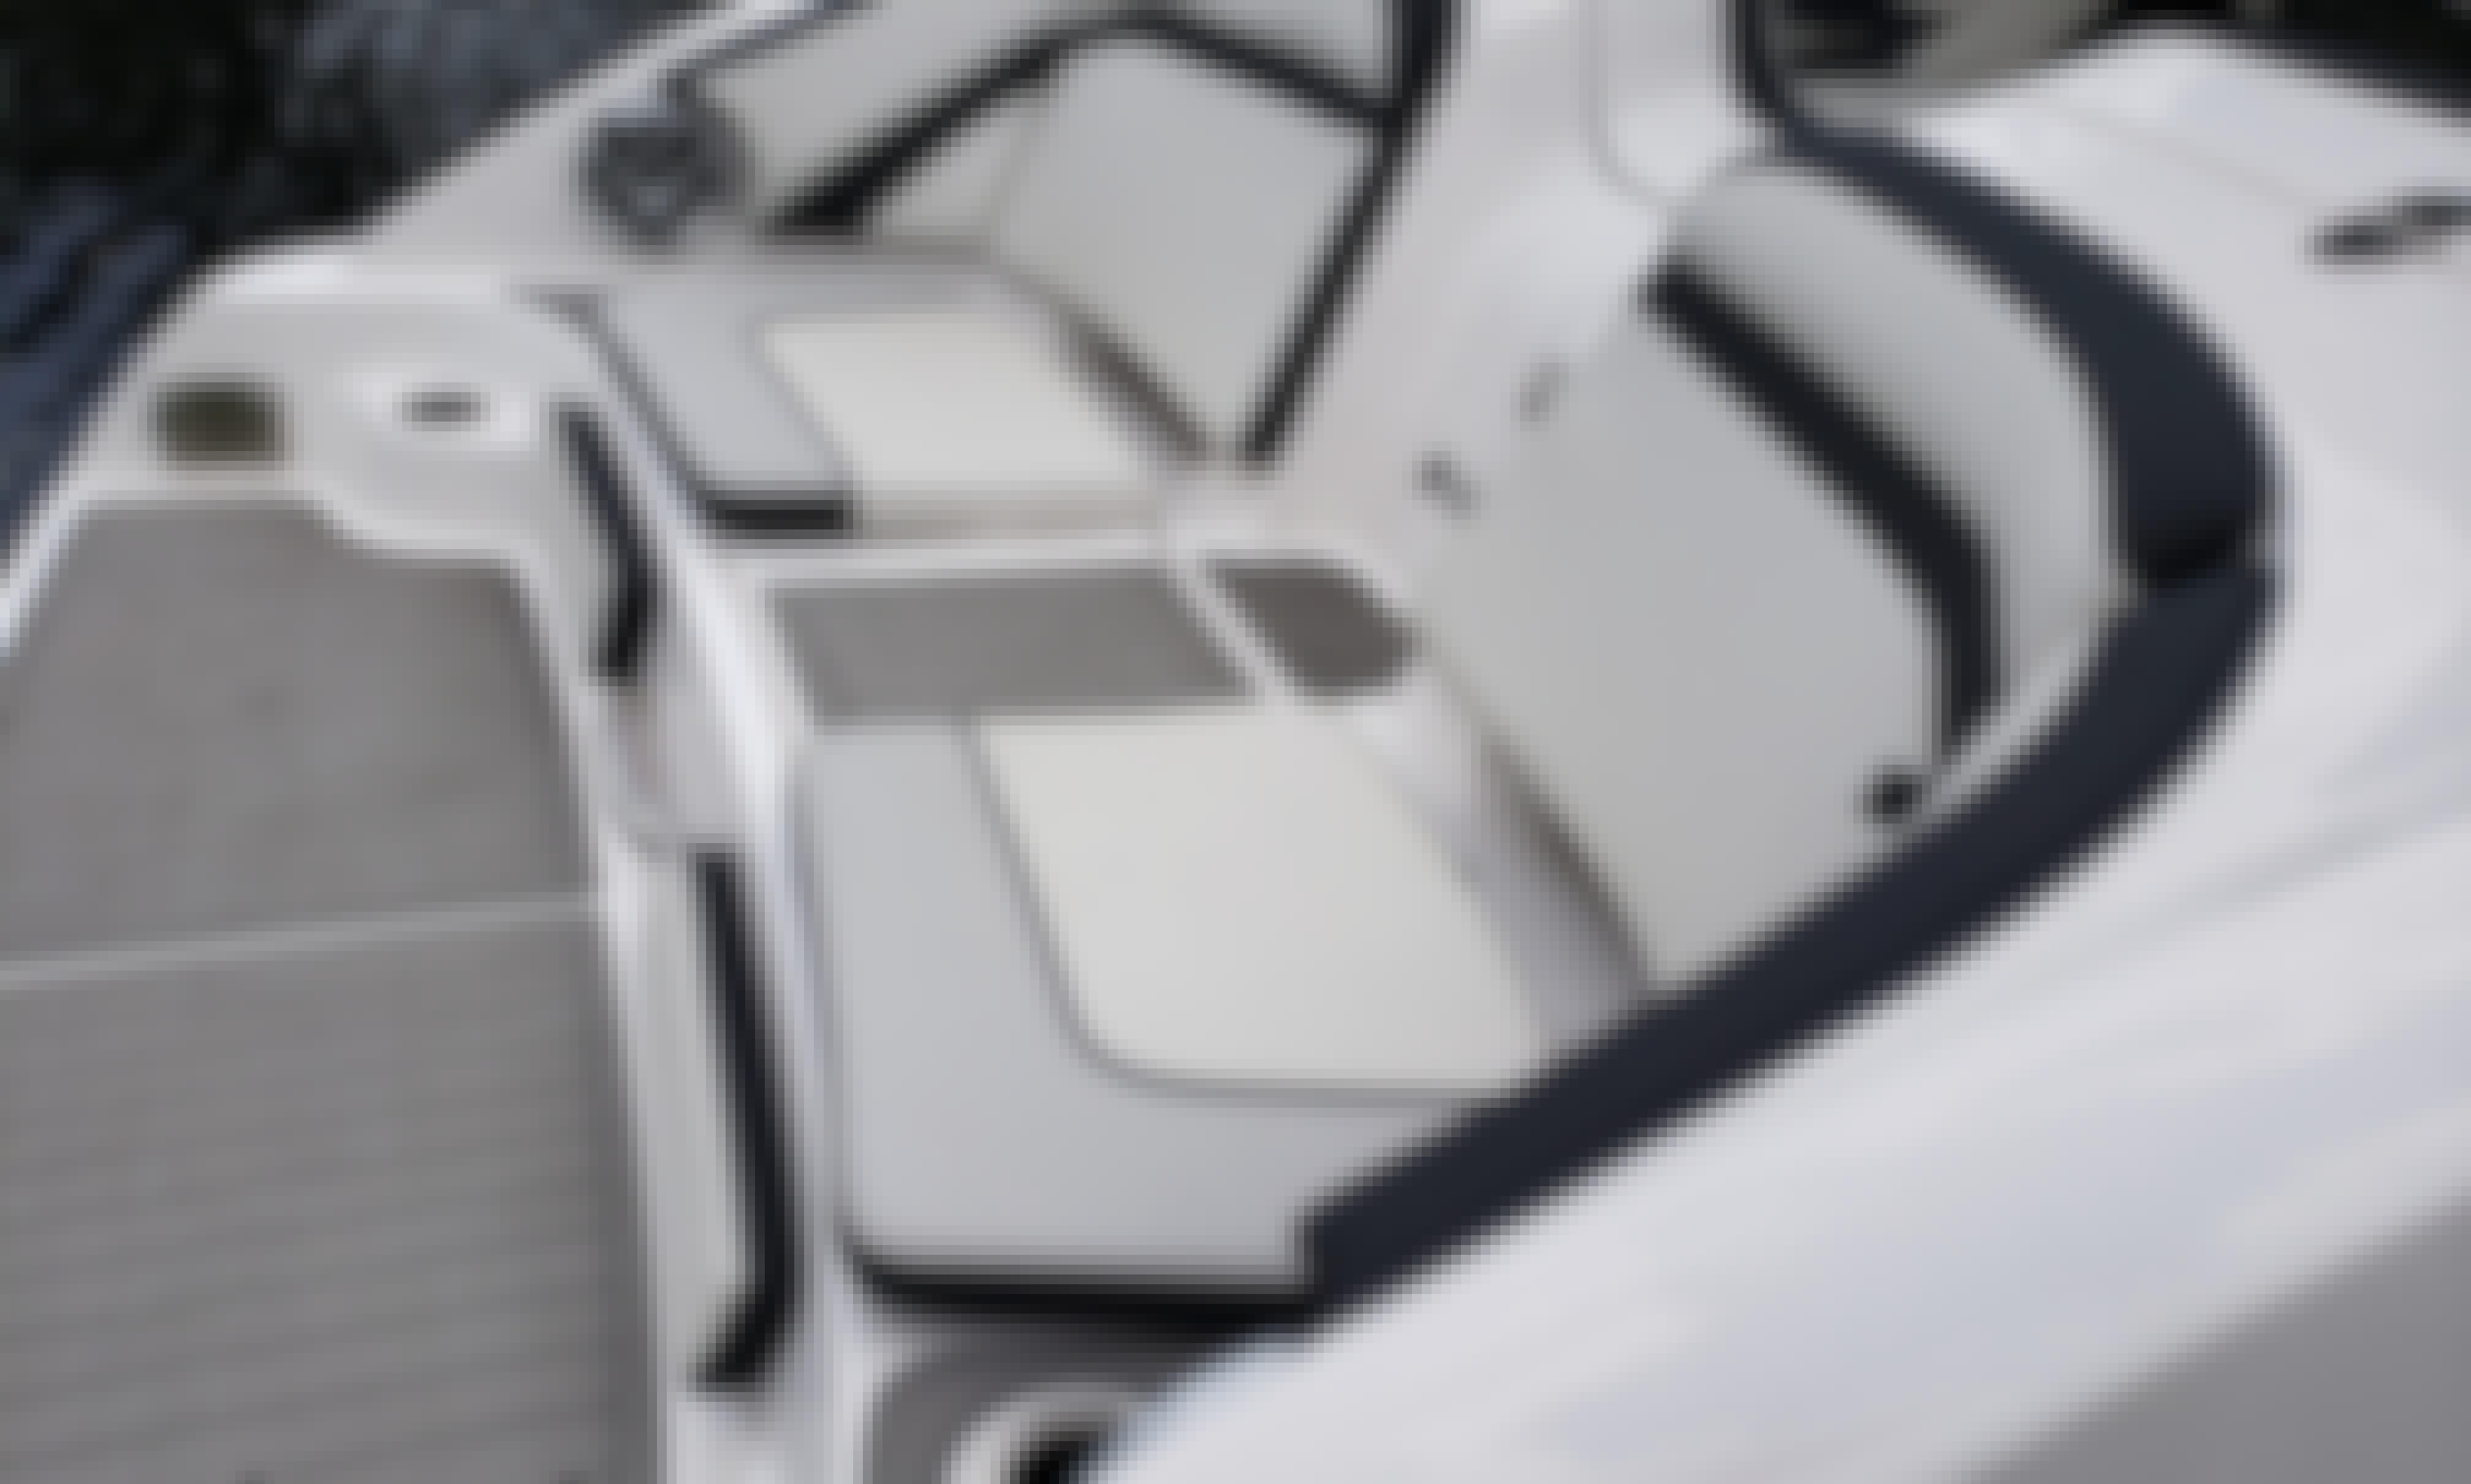 24' Brand New 2020 Yamaha 242S with 360 hp in Bradenton, Florida!